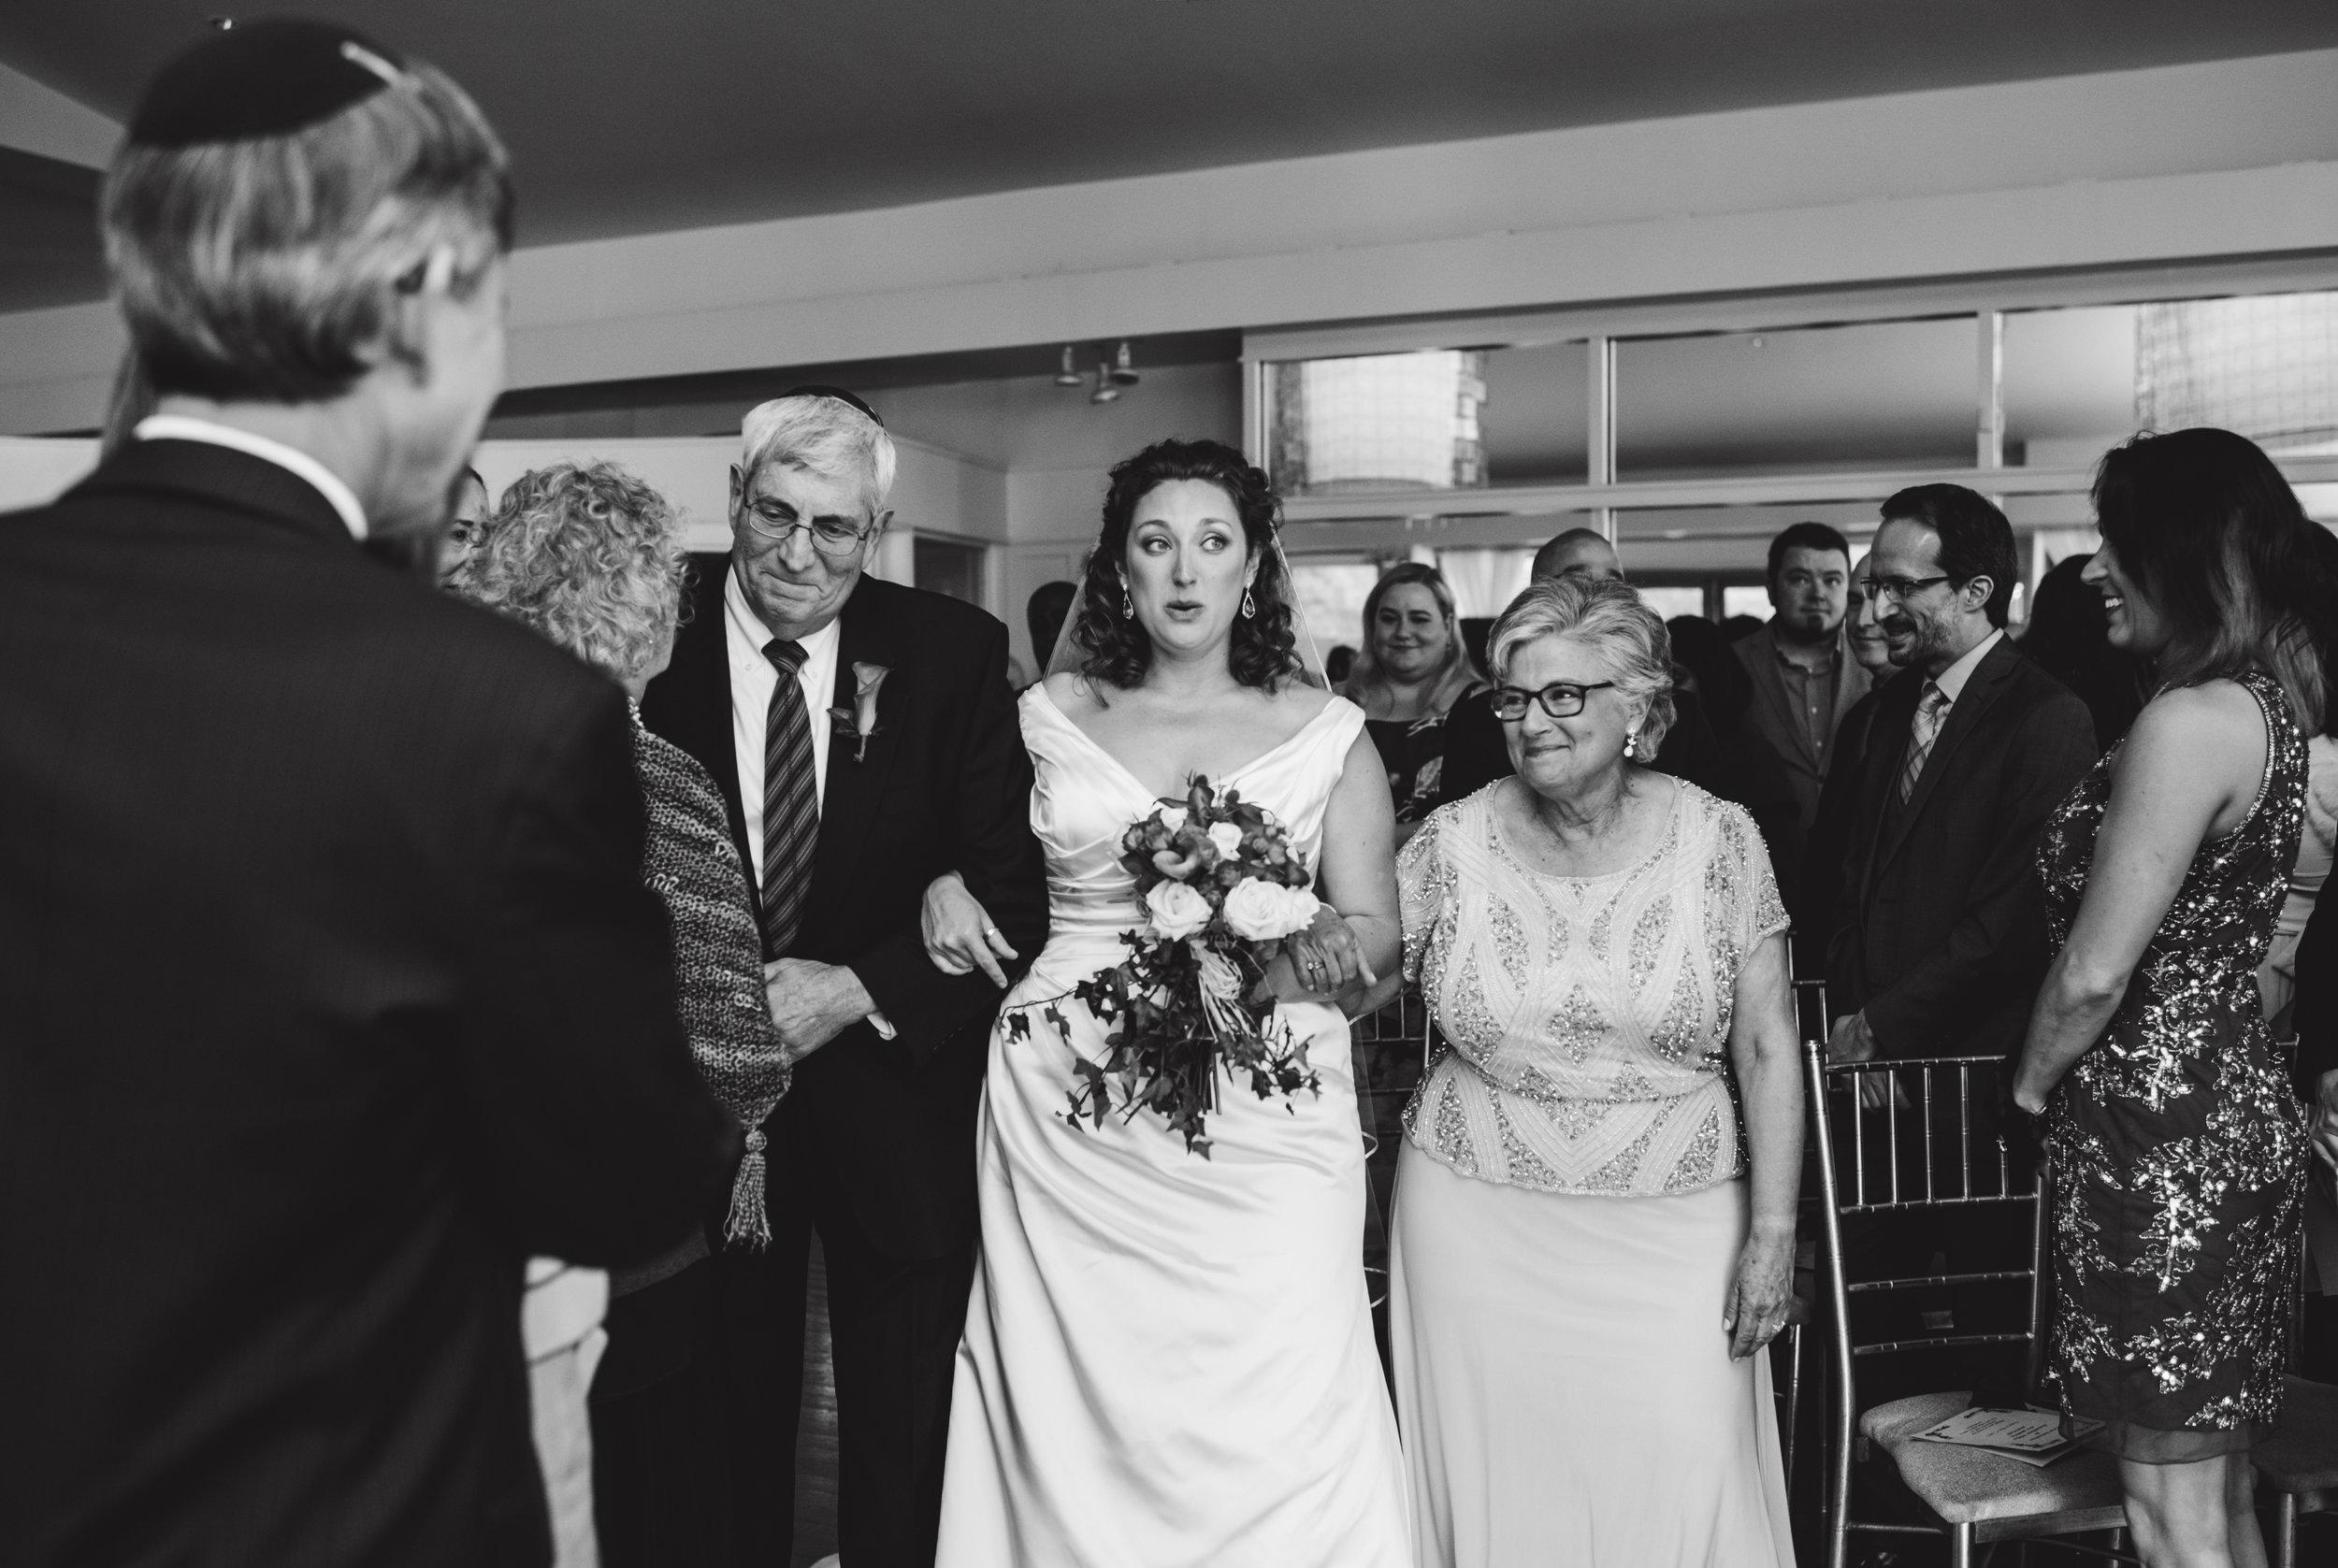 LIZA & JON - BATTERY PARK WEDDING - NYC INTIMATE WEDDING PHOTOGRAPHER - CHI-CHI AGBIM-365.jpg